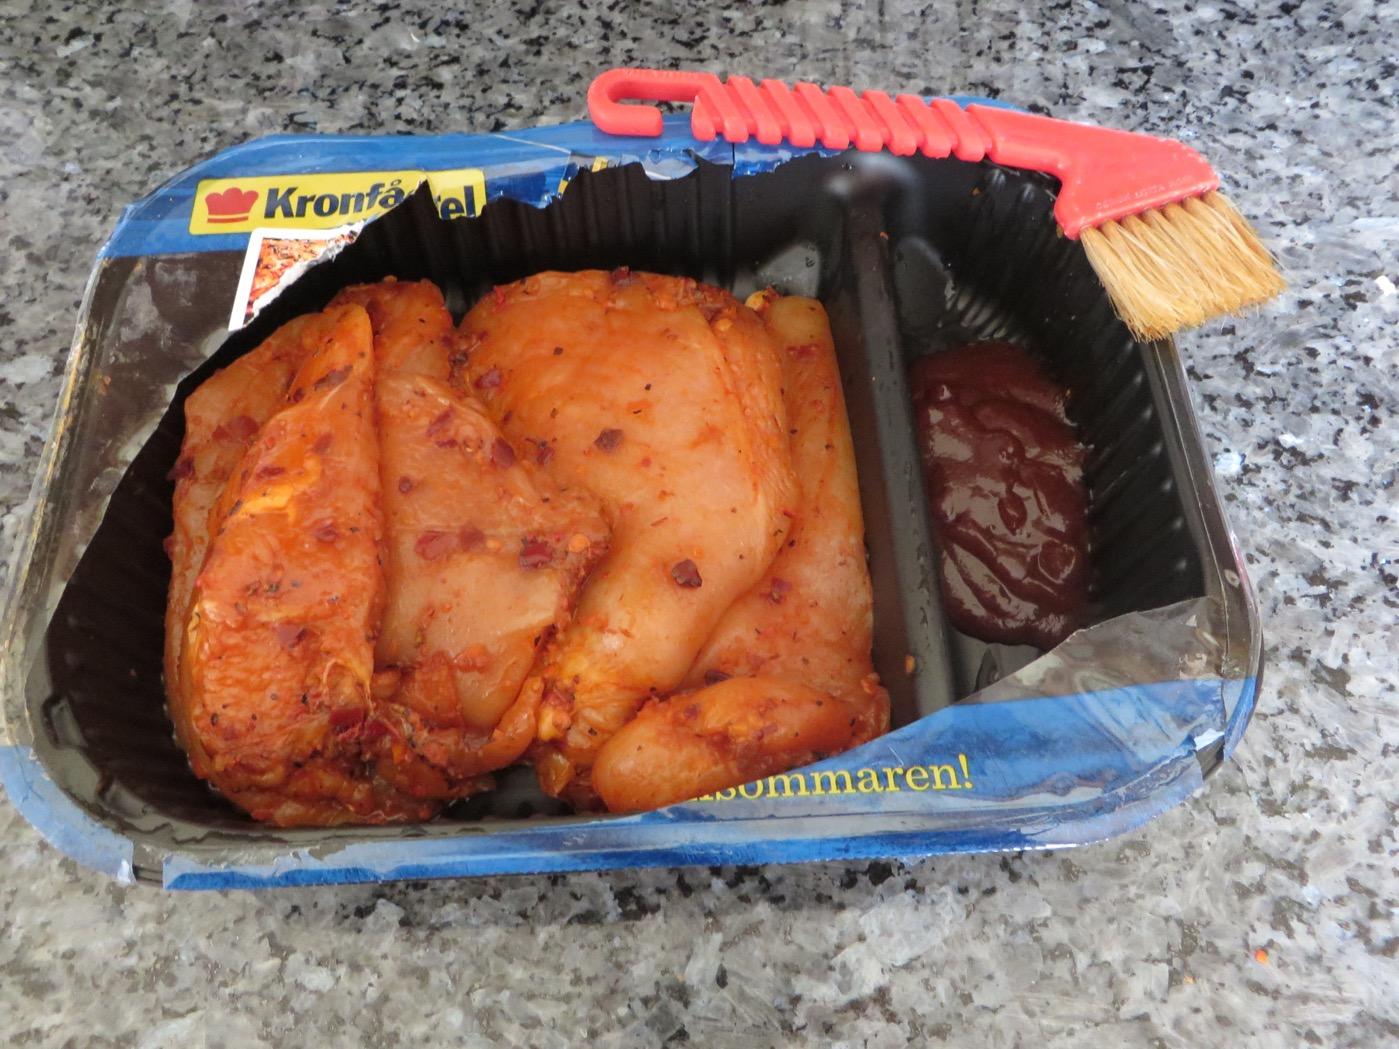 Marinerad kyckling i ena facket och glaze i andra facket.